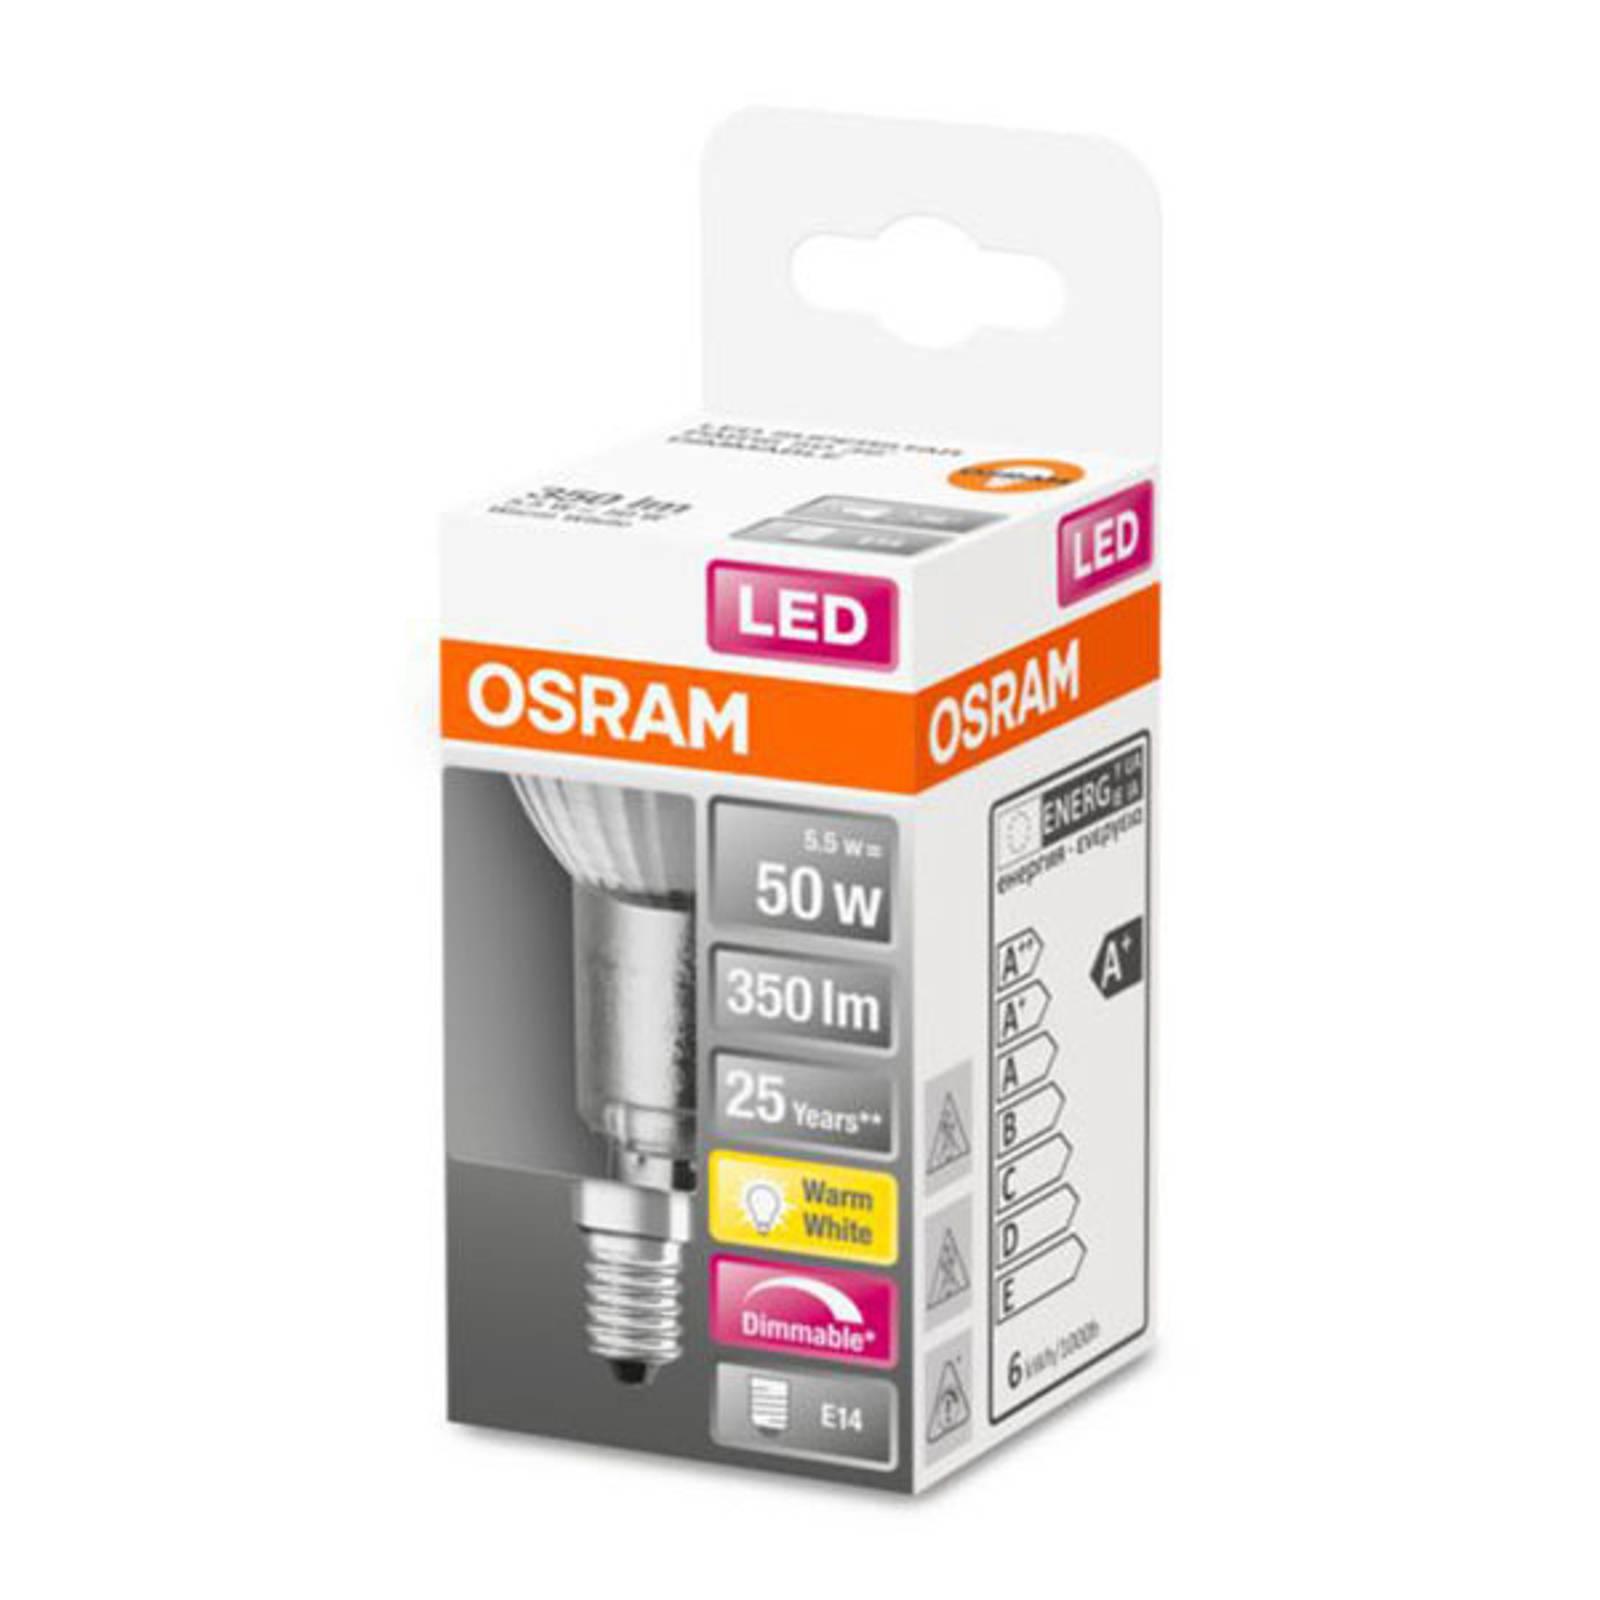 OSRAM LED bulb E14 4,8W PAR16 2,700 K dimmable